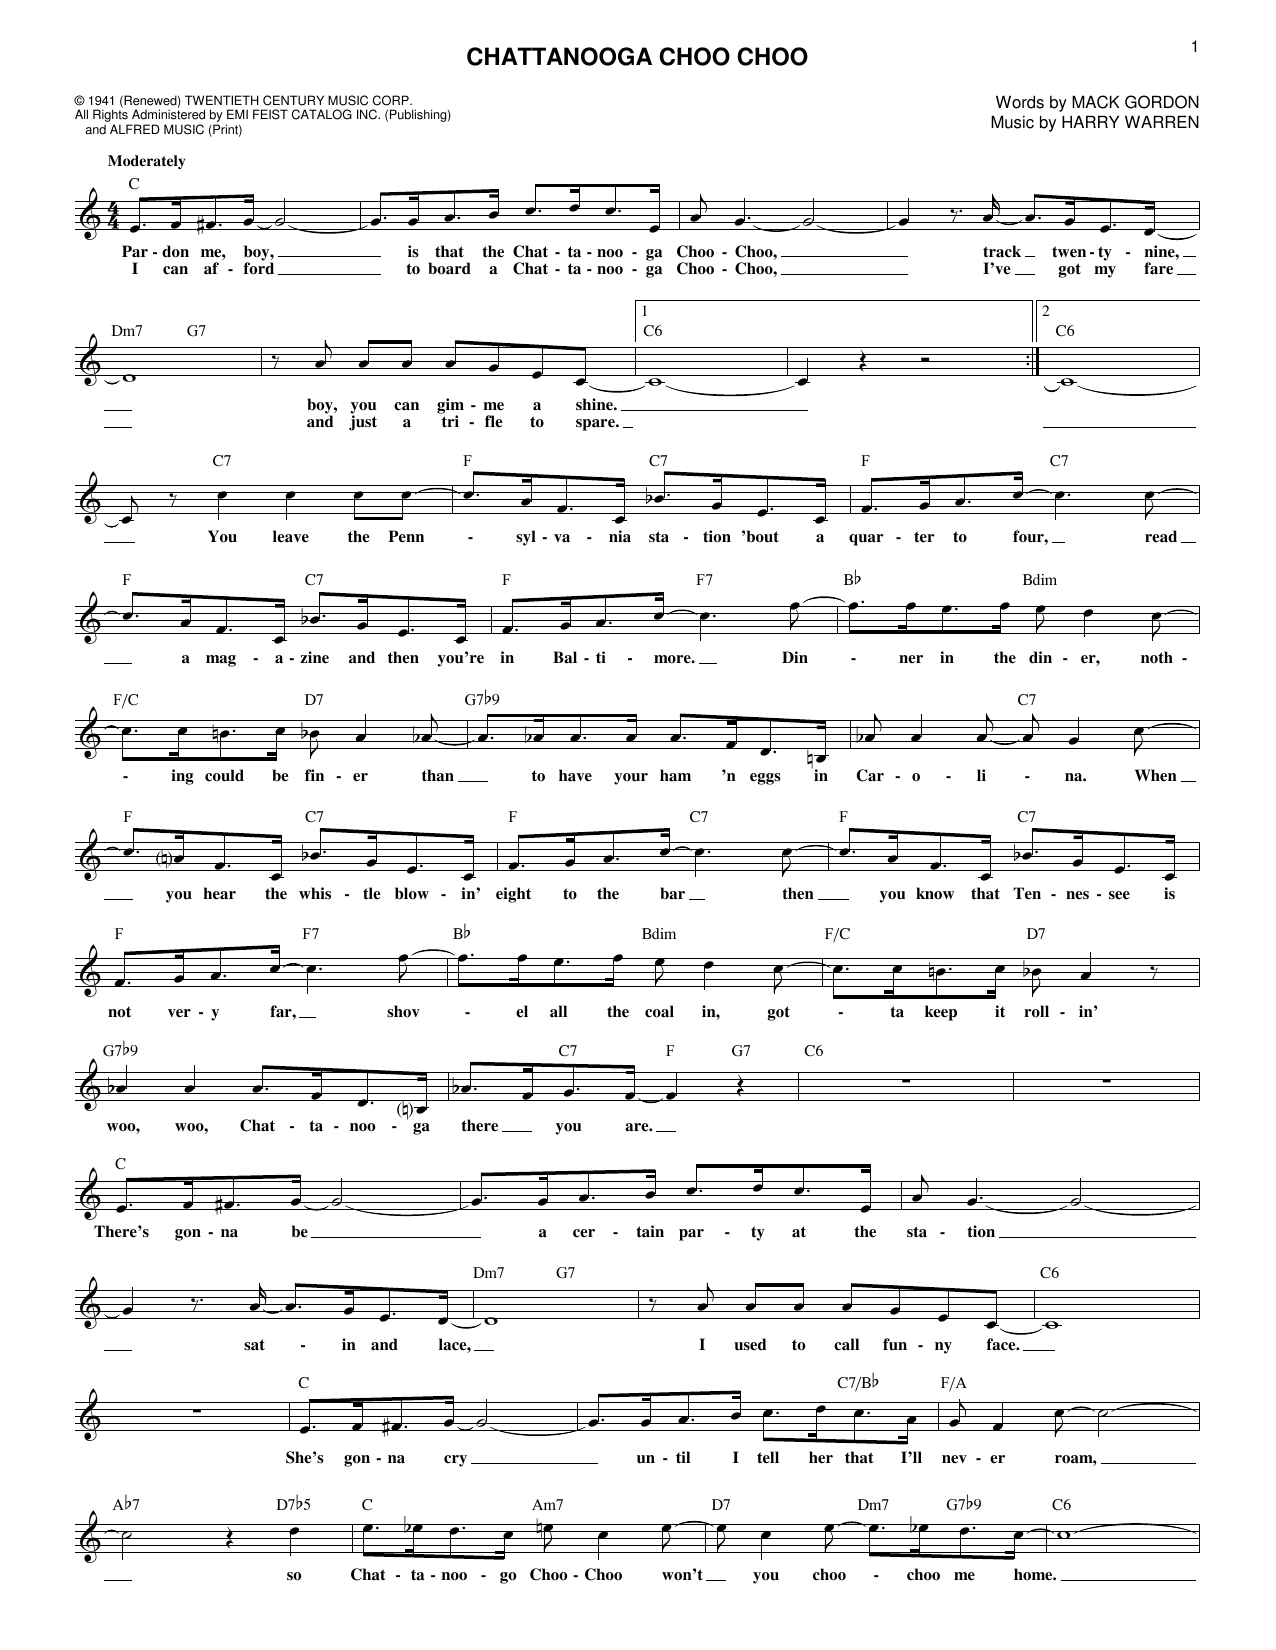 Mack Gordon Chattanooga Choo Choo sheet music notes and chords. Download Printable PDF.